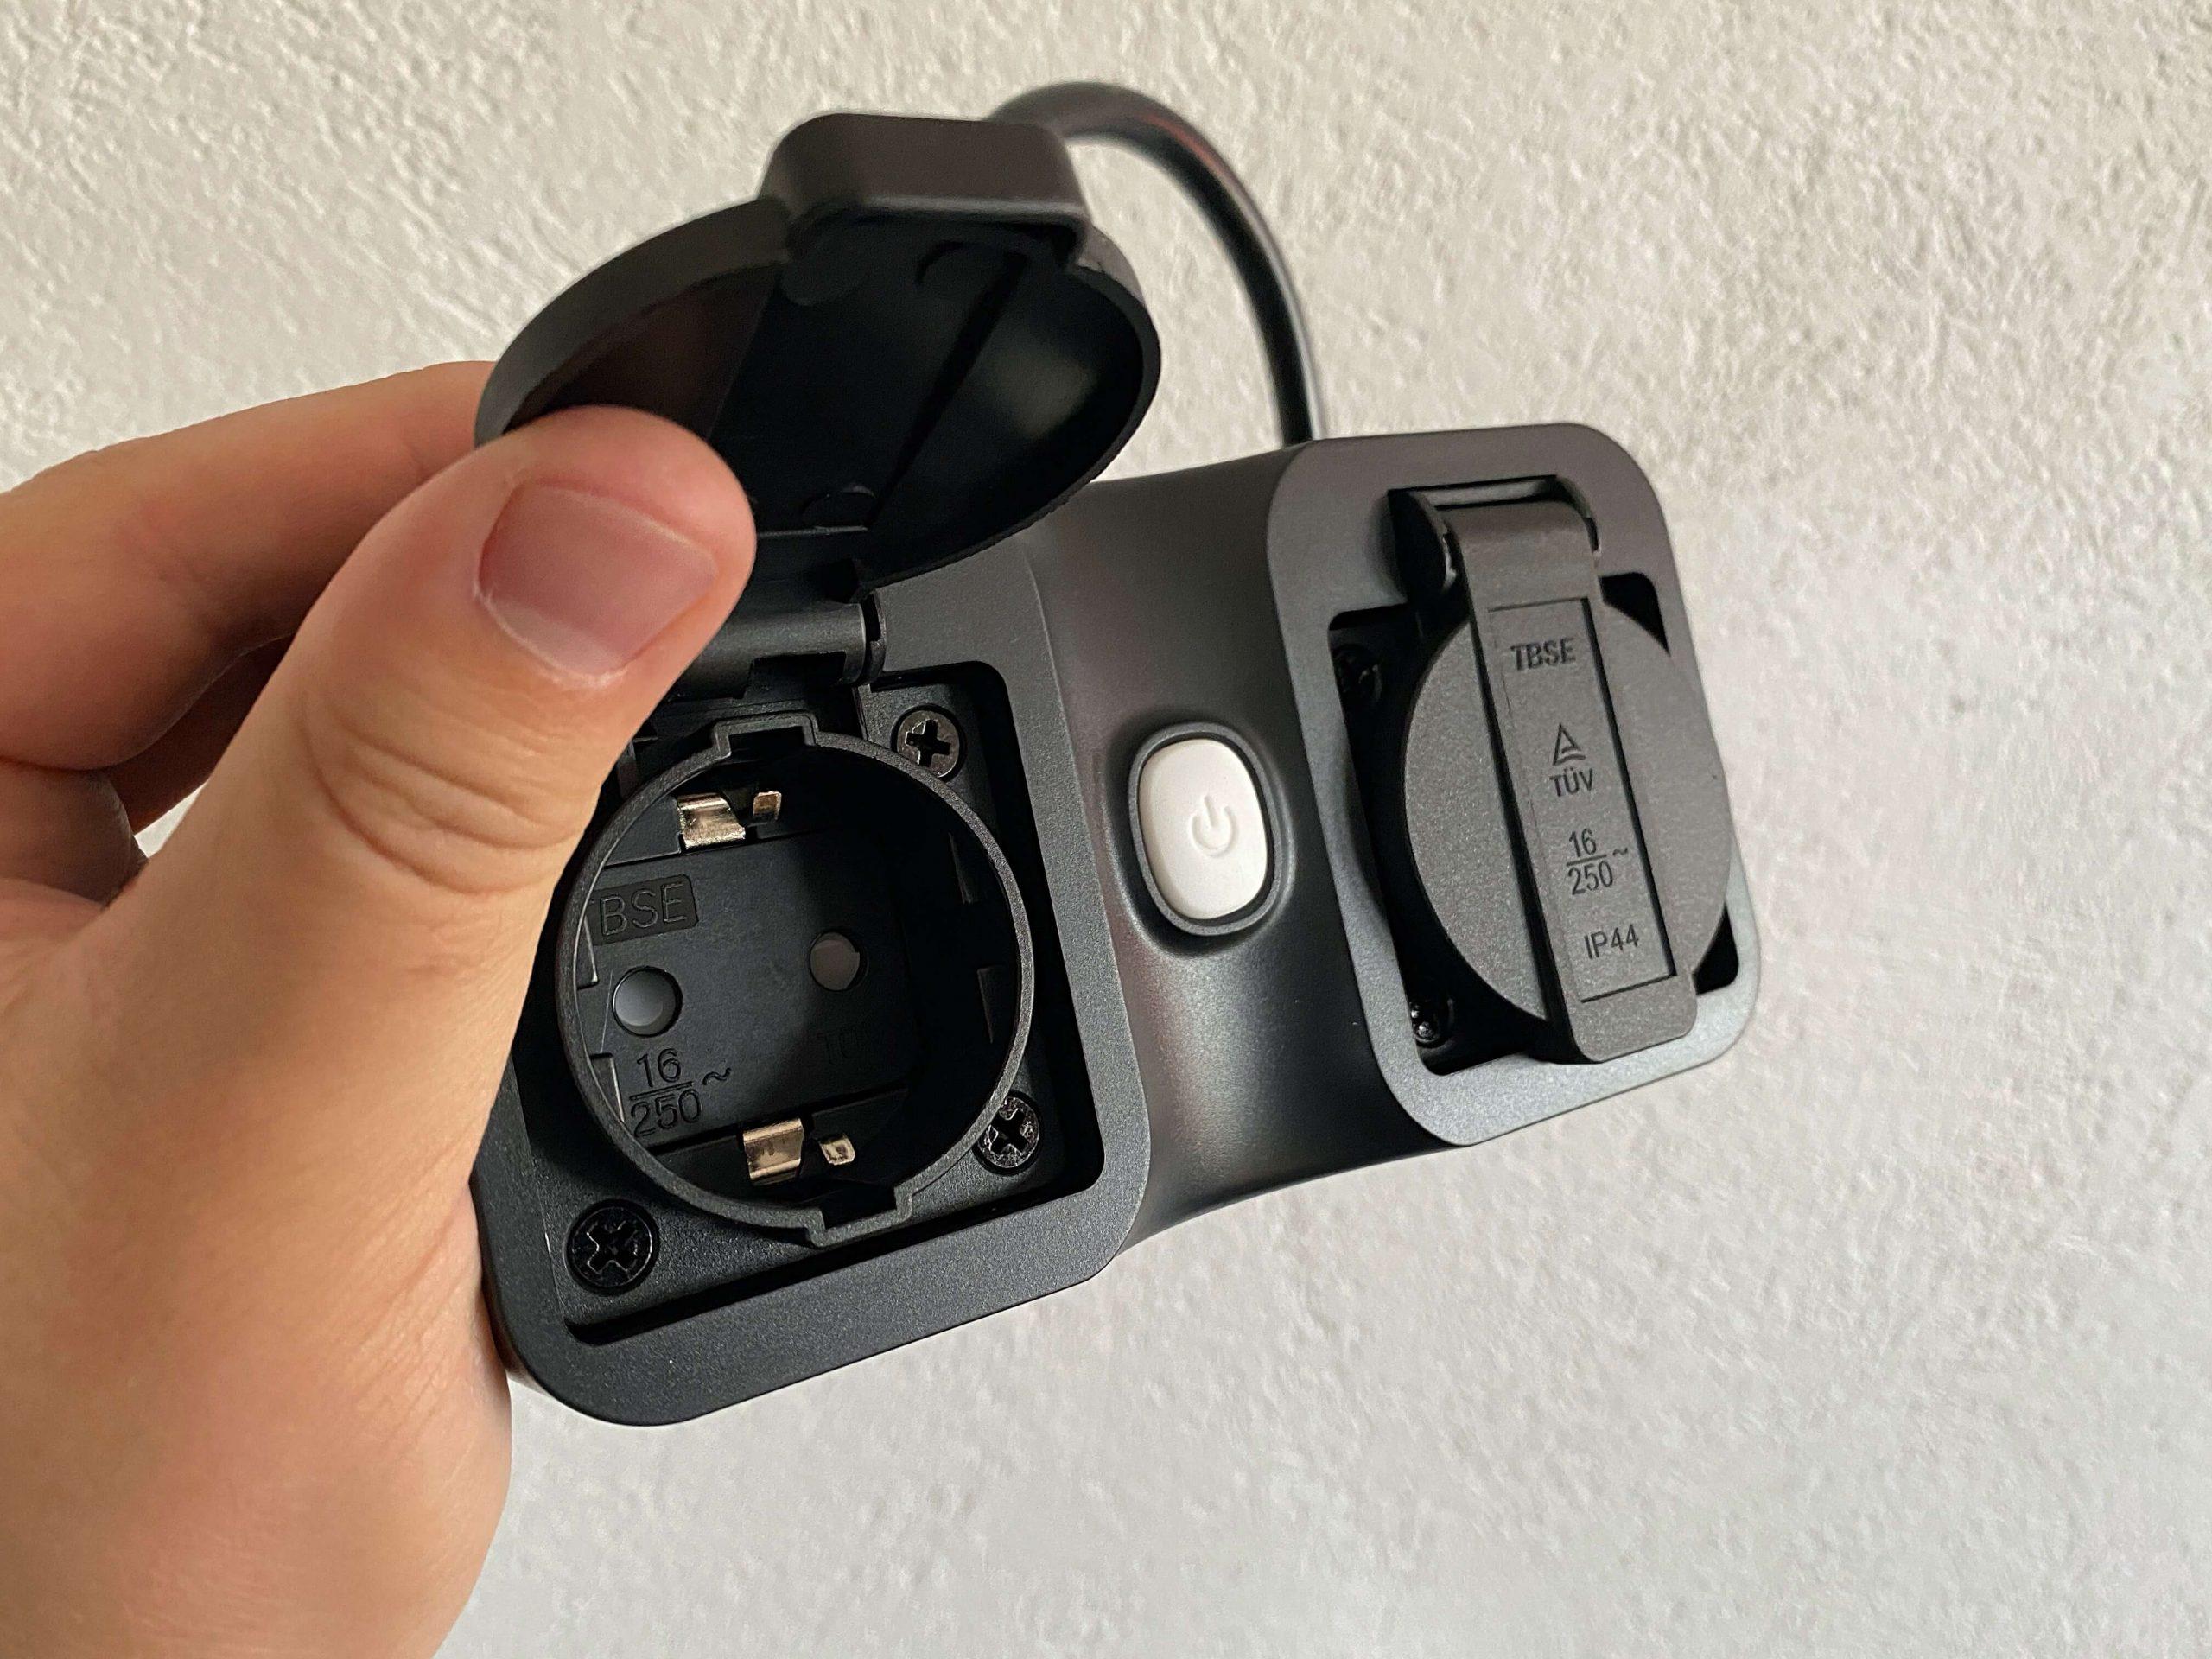 IP44-Aussensteckdose-von-Meross-Apple-HomeKit-Geraete-wettergeschuetzt-bedienen5-scaled IP44-Außensteckdose von Meross - Apple HomeKit-Geräte wettergeschützt bedienen